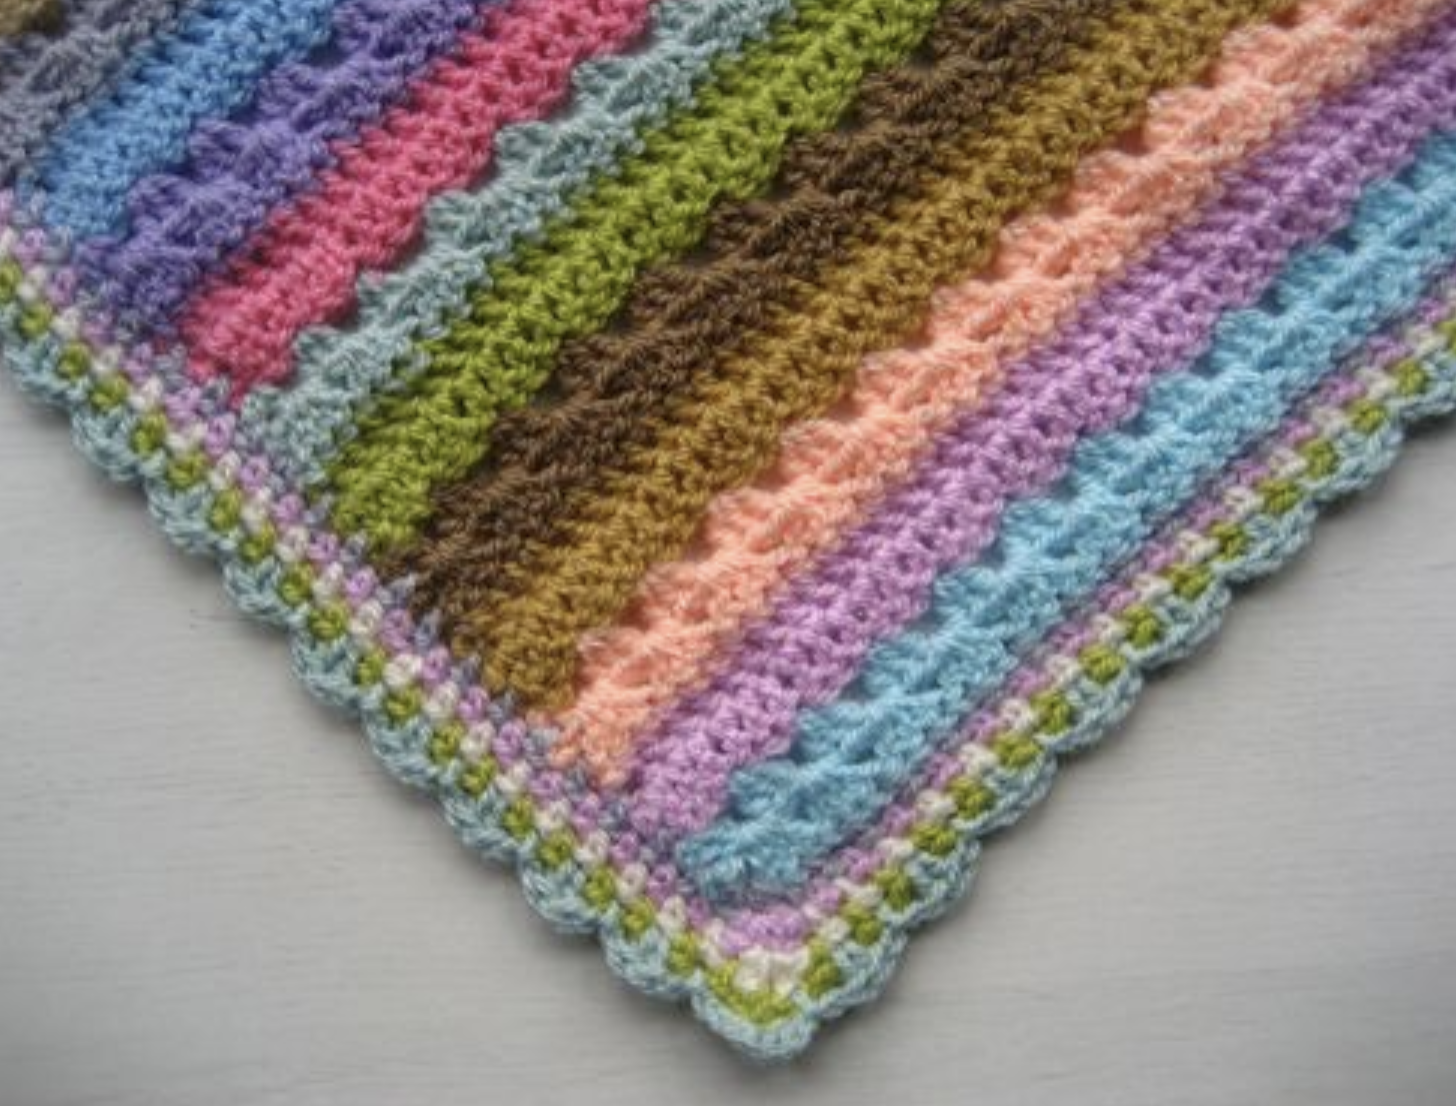 Linen Stitch Edging Linen Stitch Granny Stripe Crochet Crochet Blanket